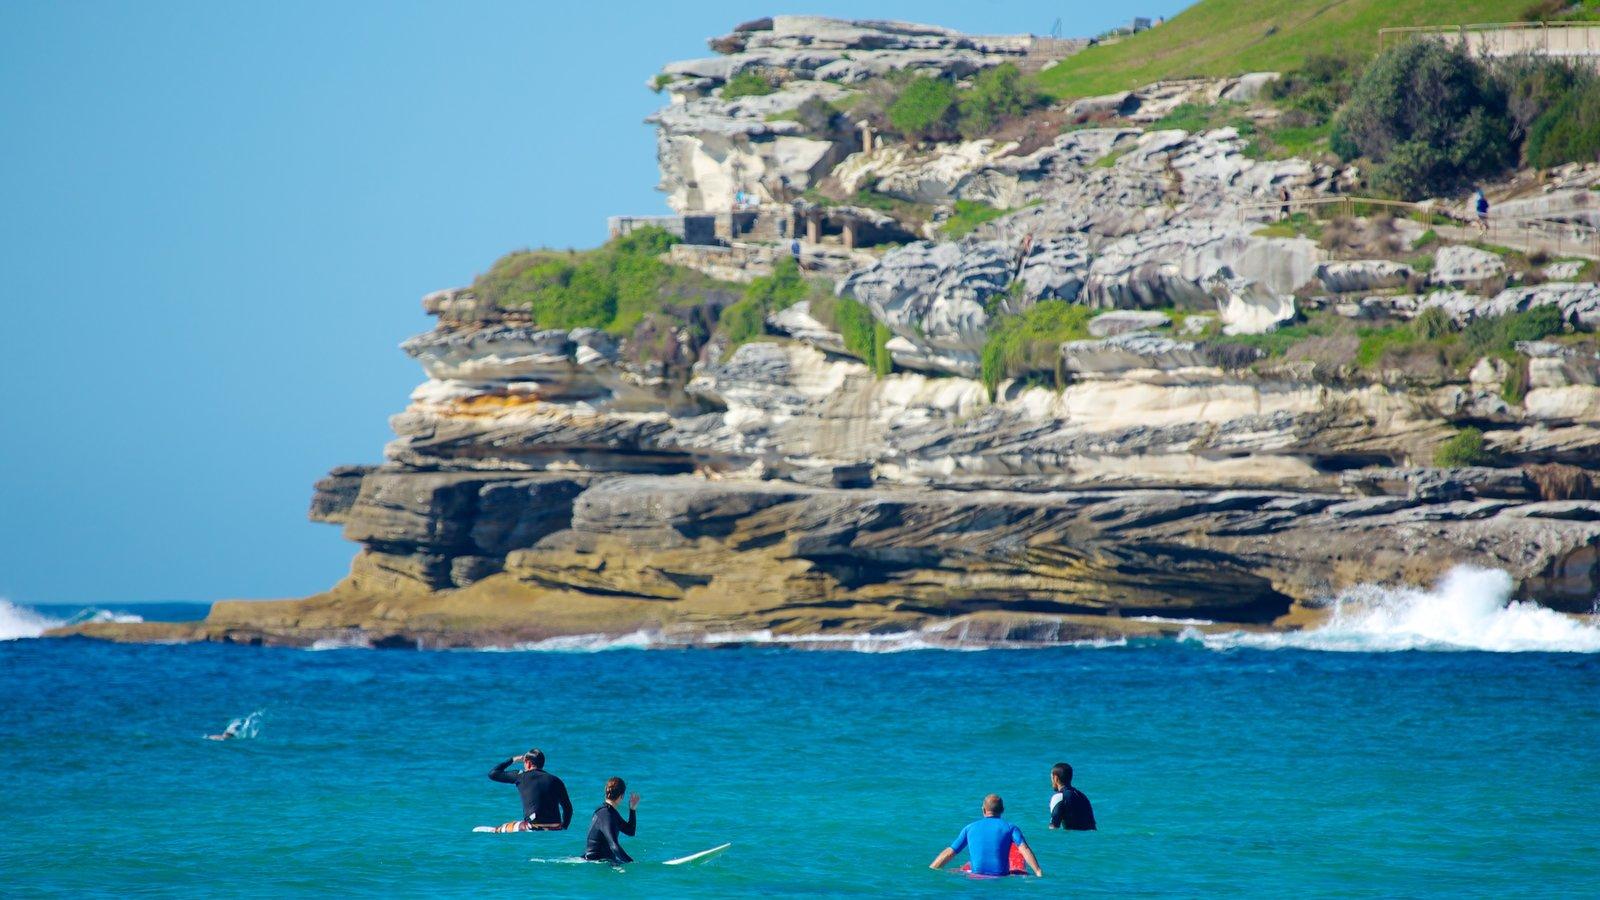 Bondi Beach showing rocky coastline, general coastal views and surfing